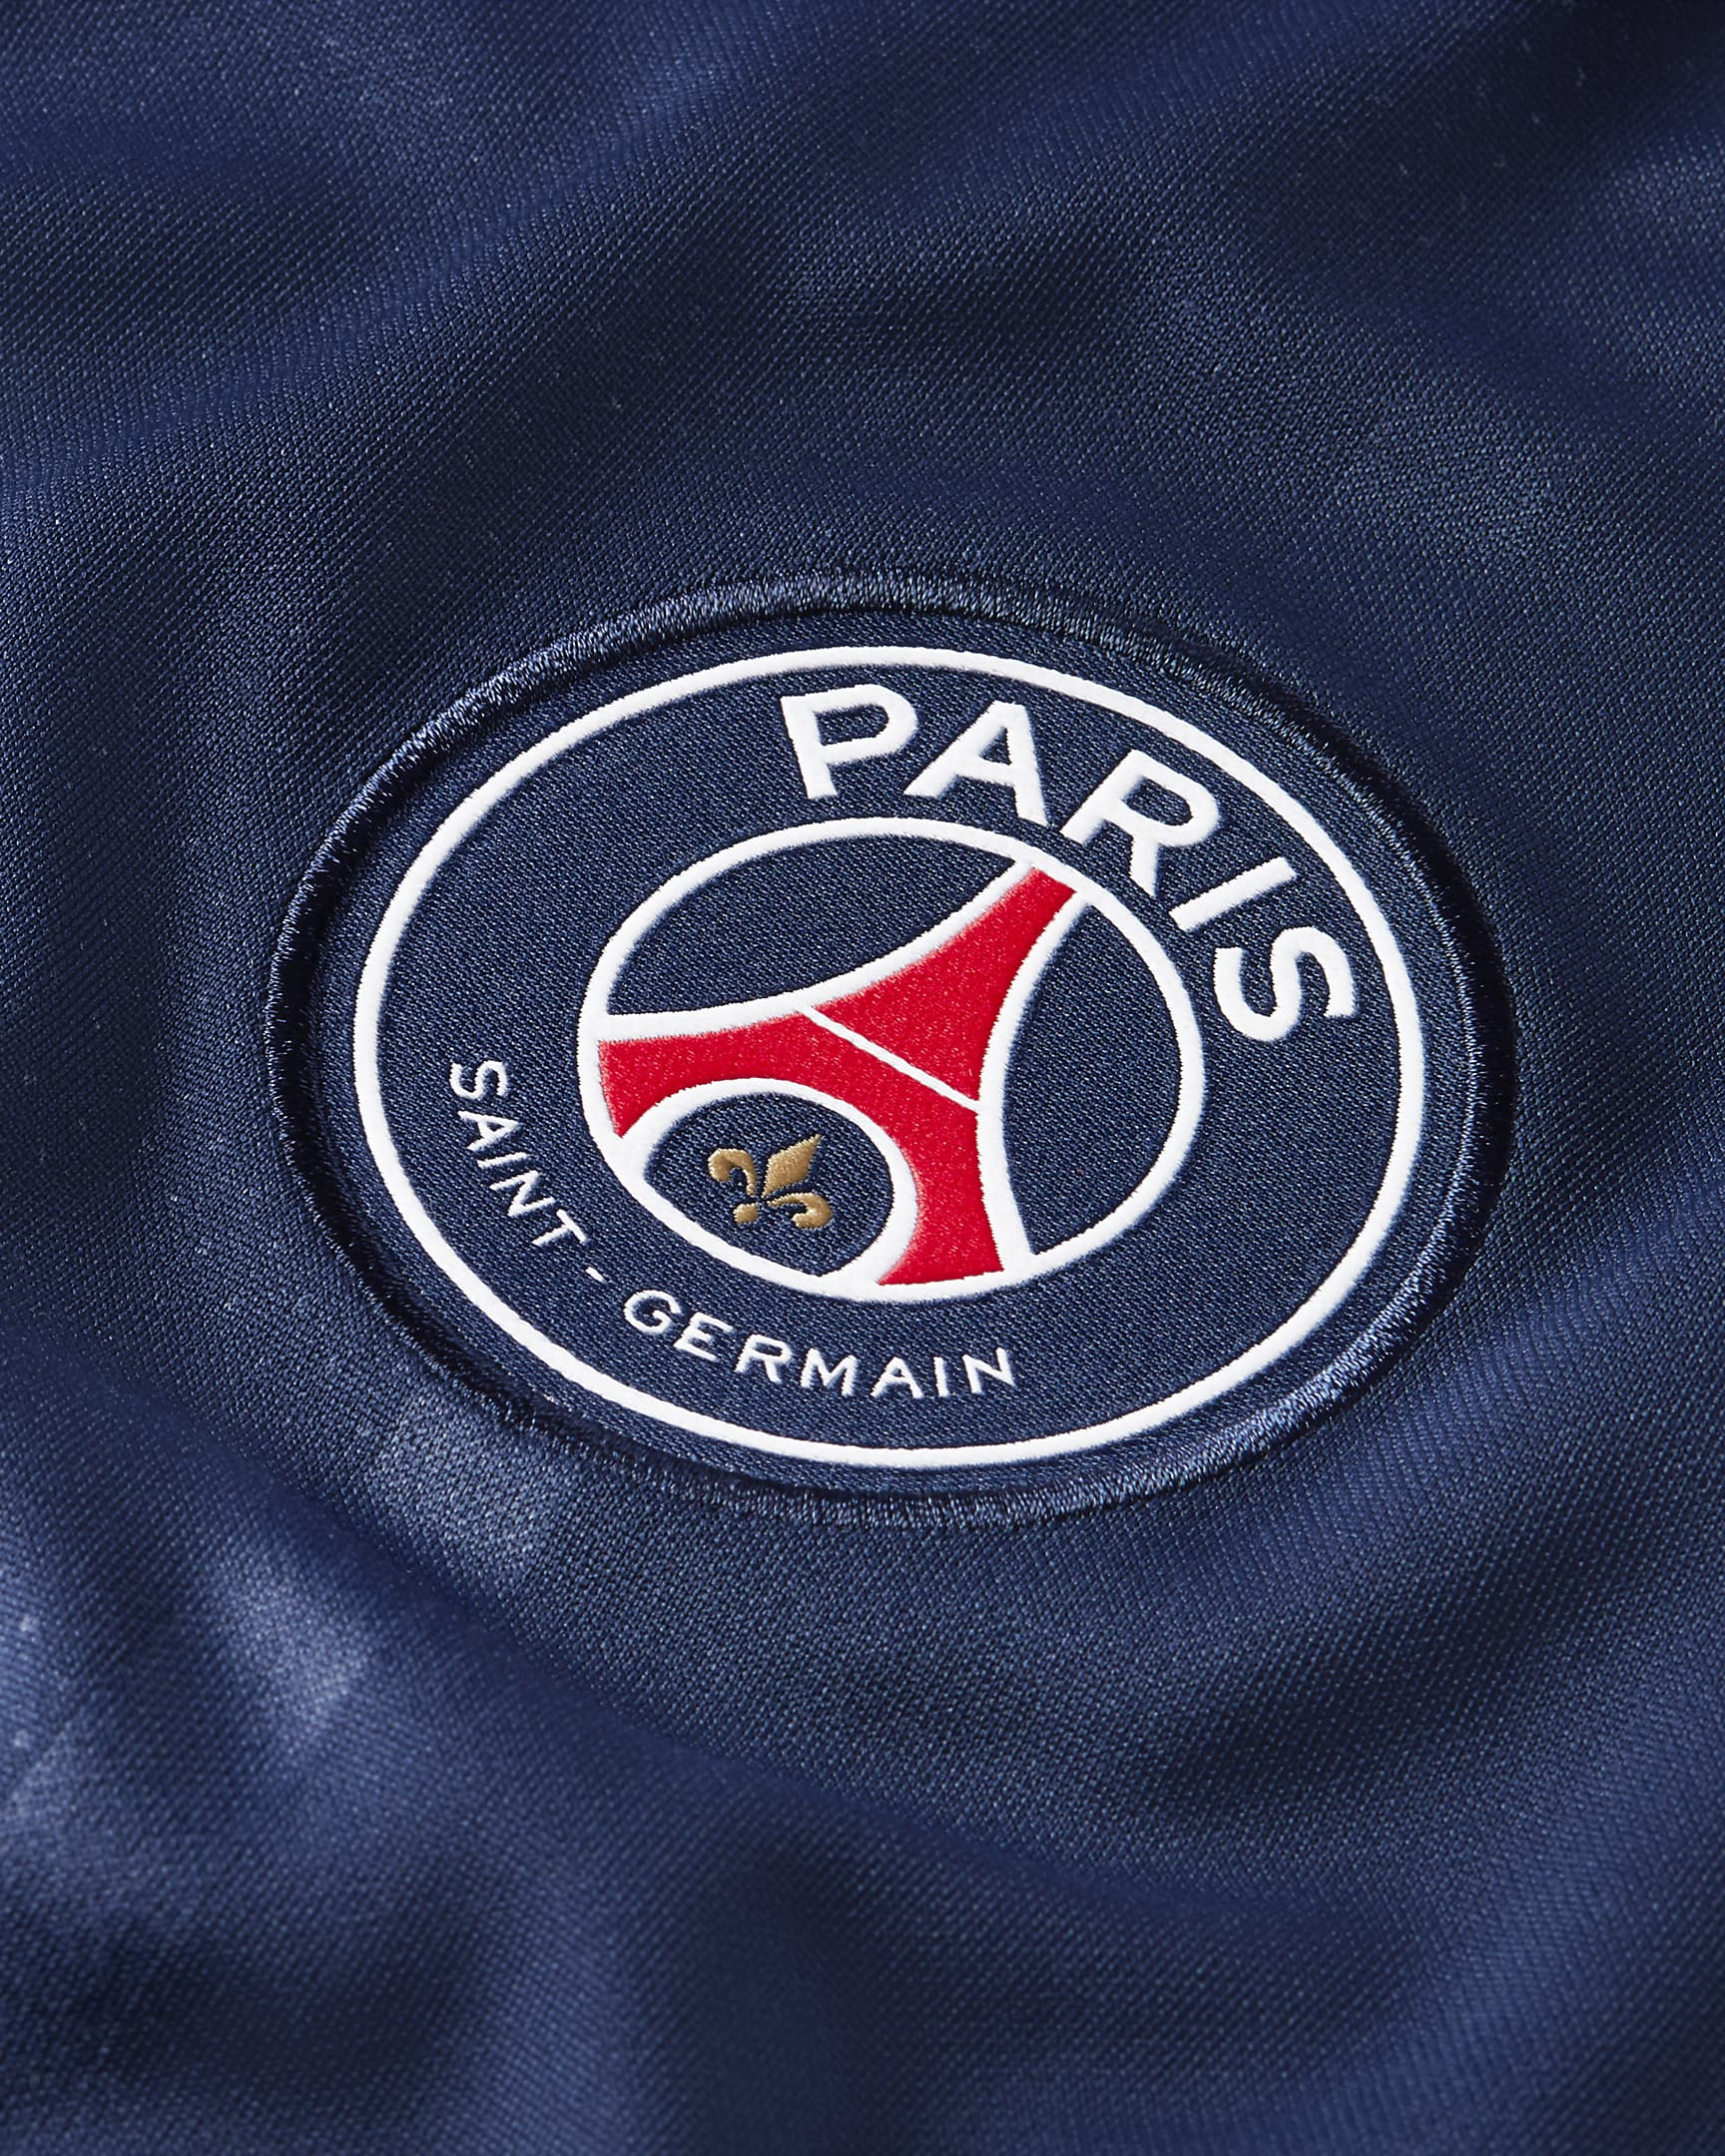 paris-saint-germain-2021-22-stadium-home-mens-soccer-jersey-jttSTs.png